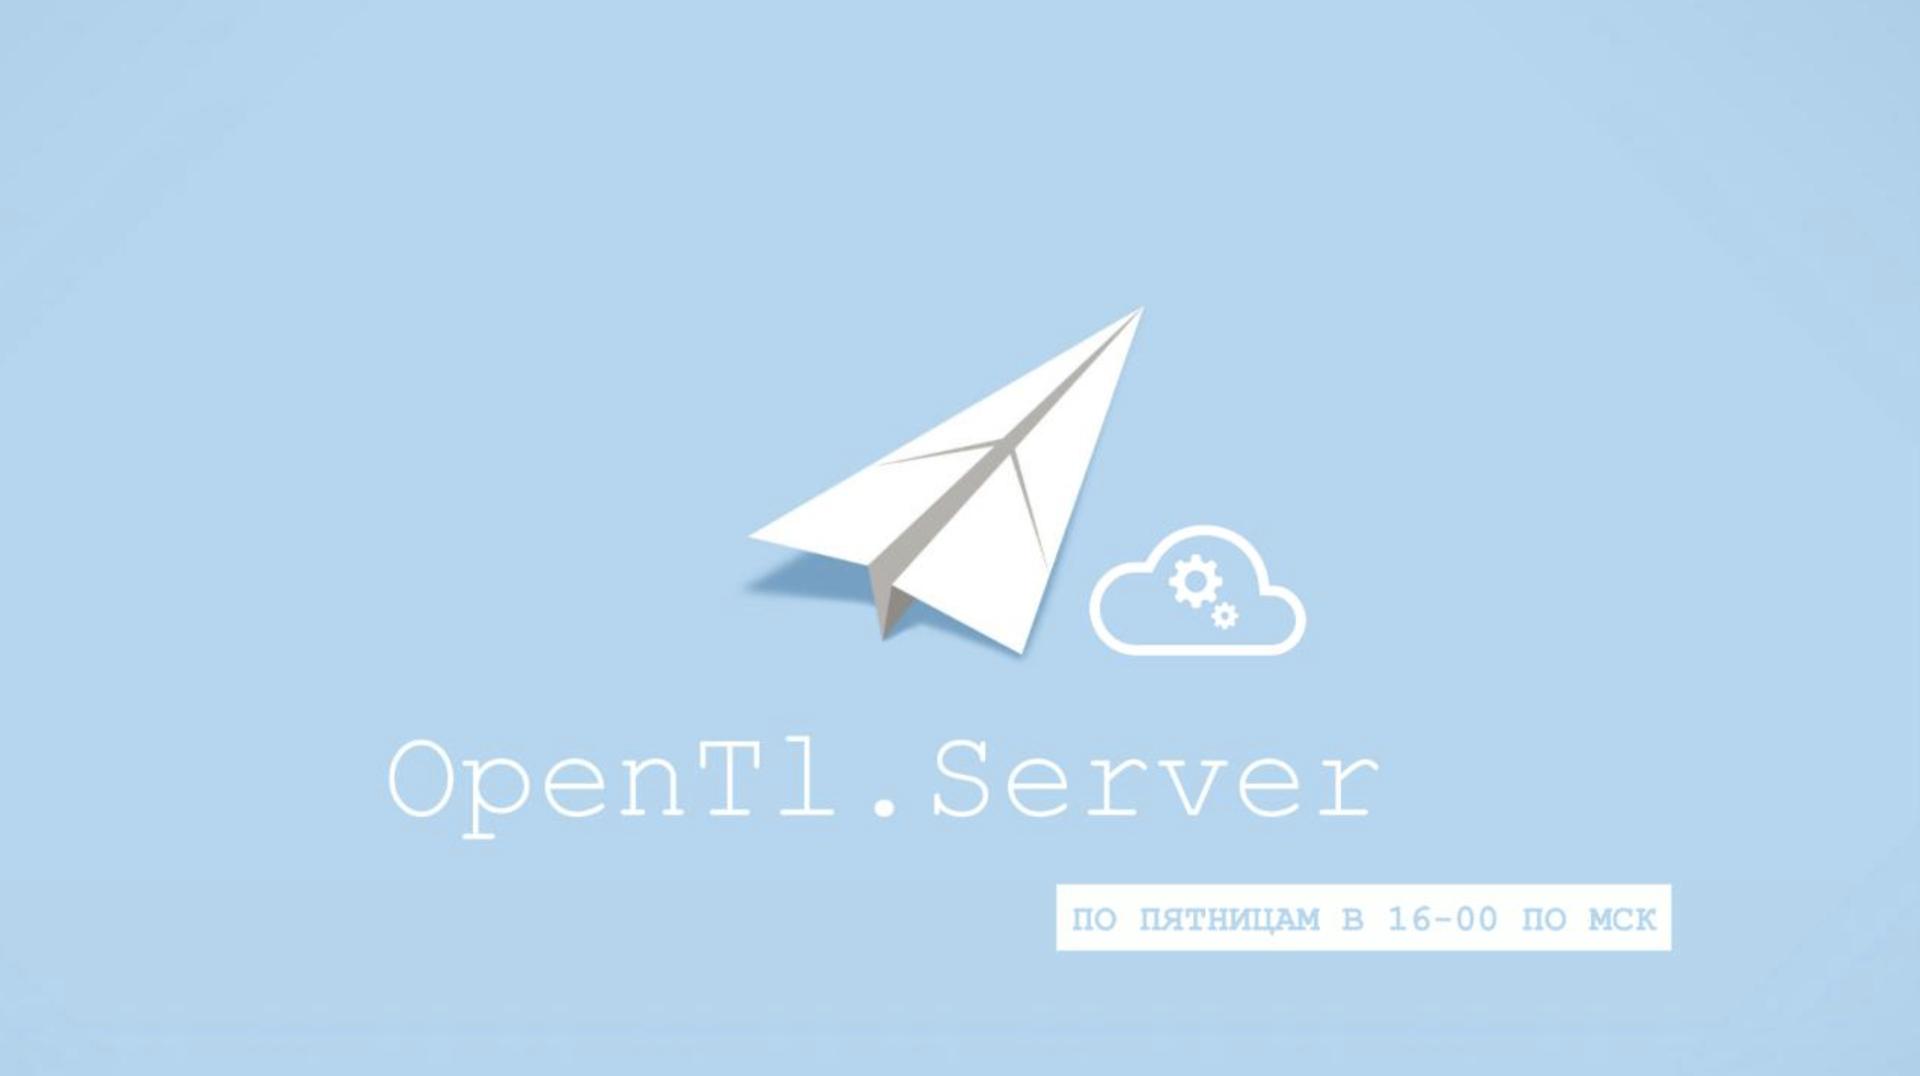 OpenTl.Server — серверная реализация мессенджера - 1